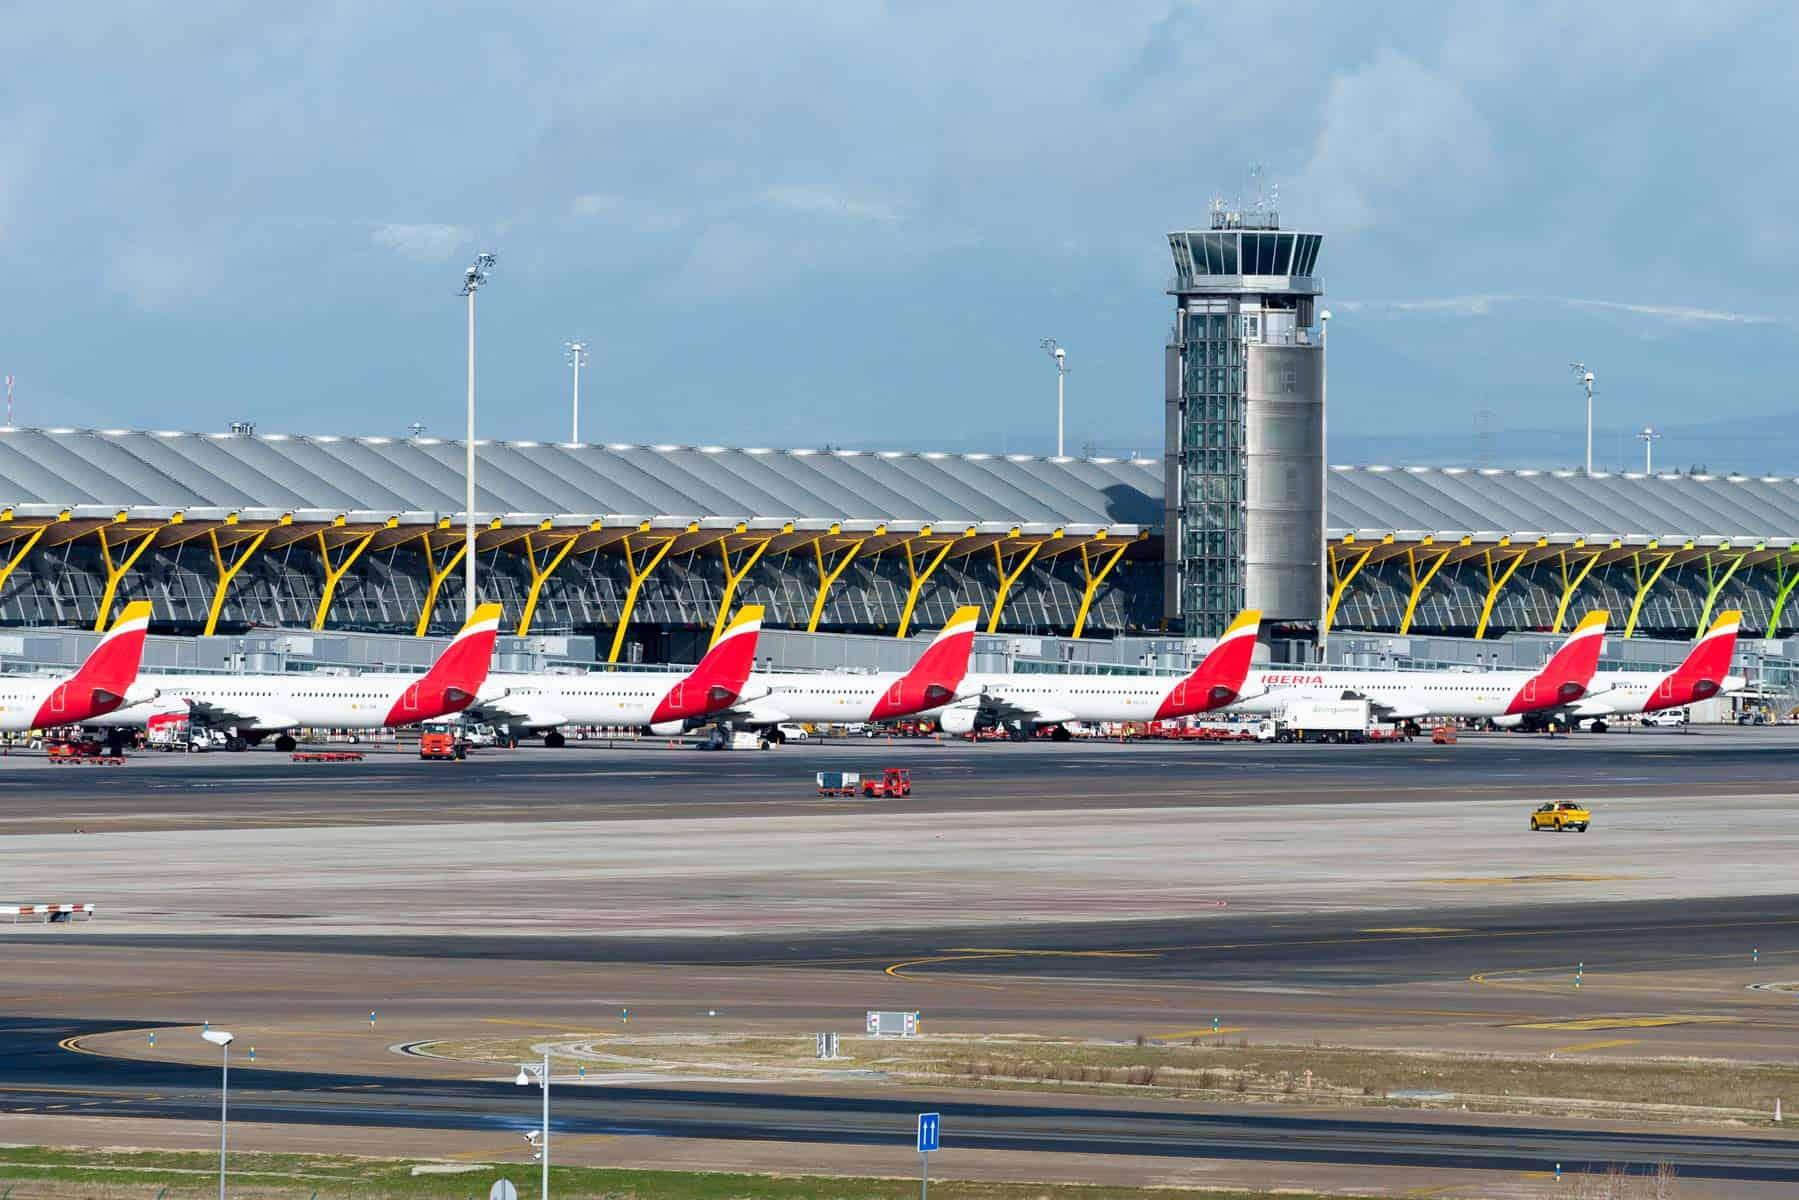 vuelos cuba espana agosto 2021